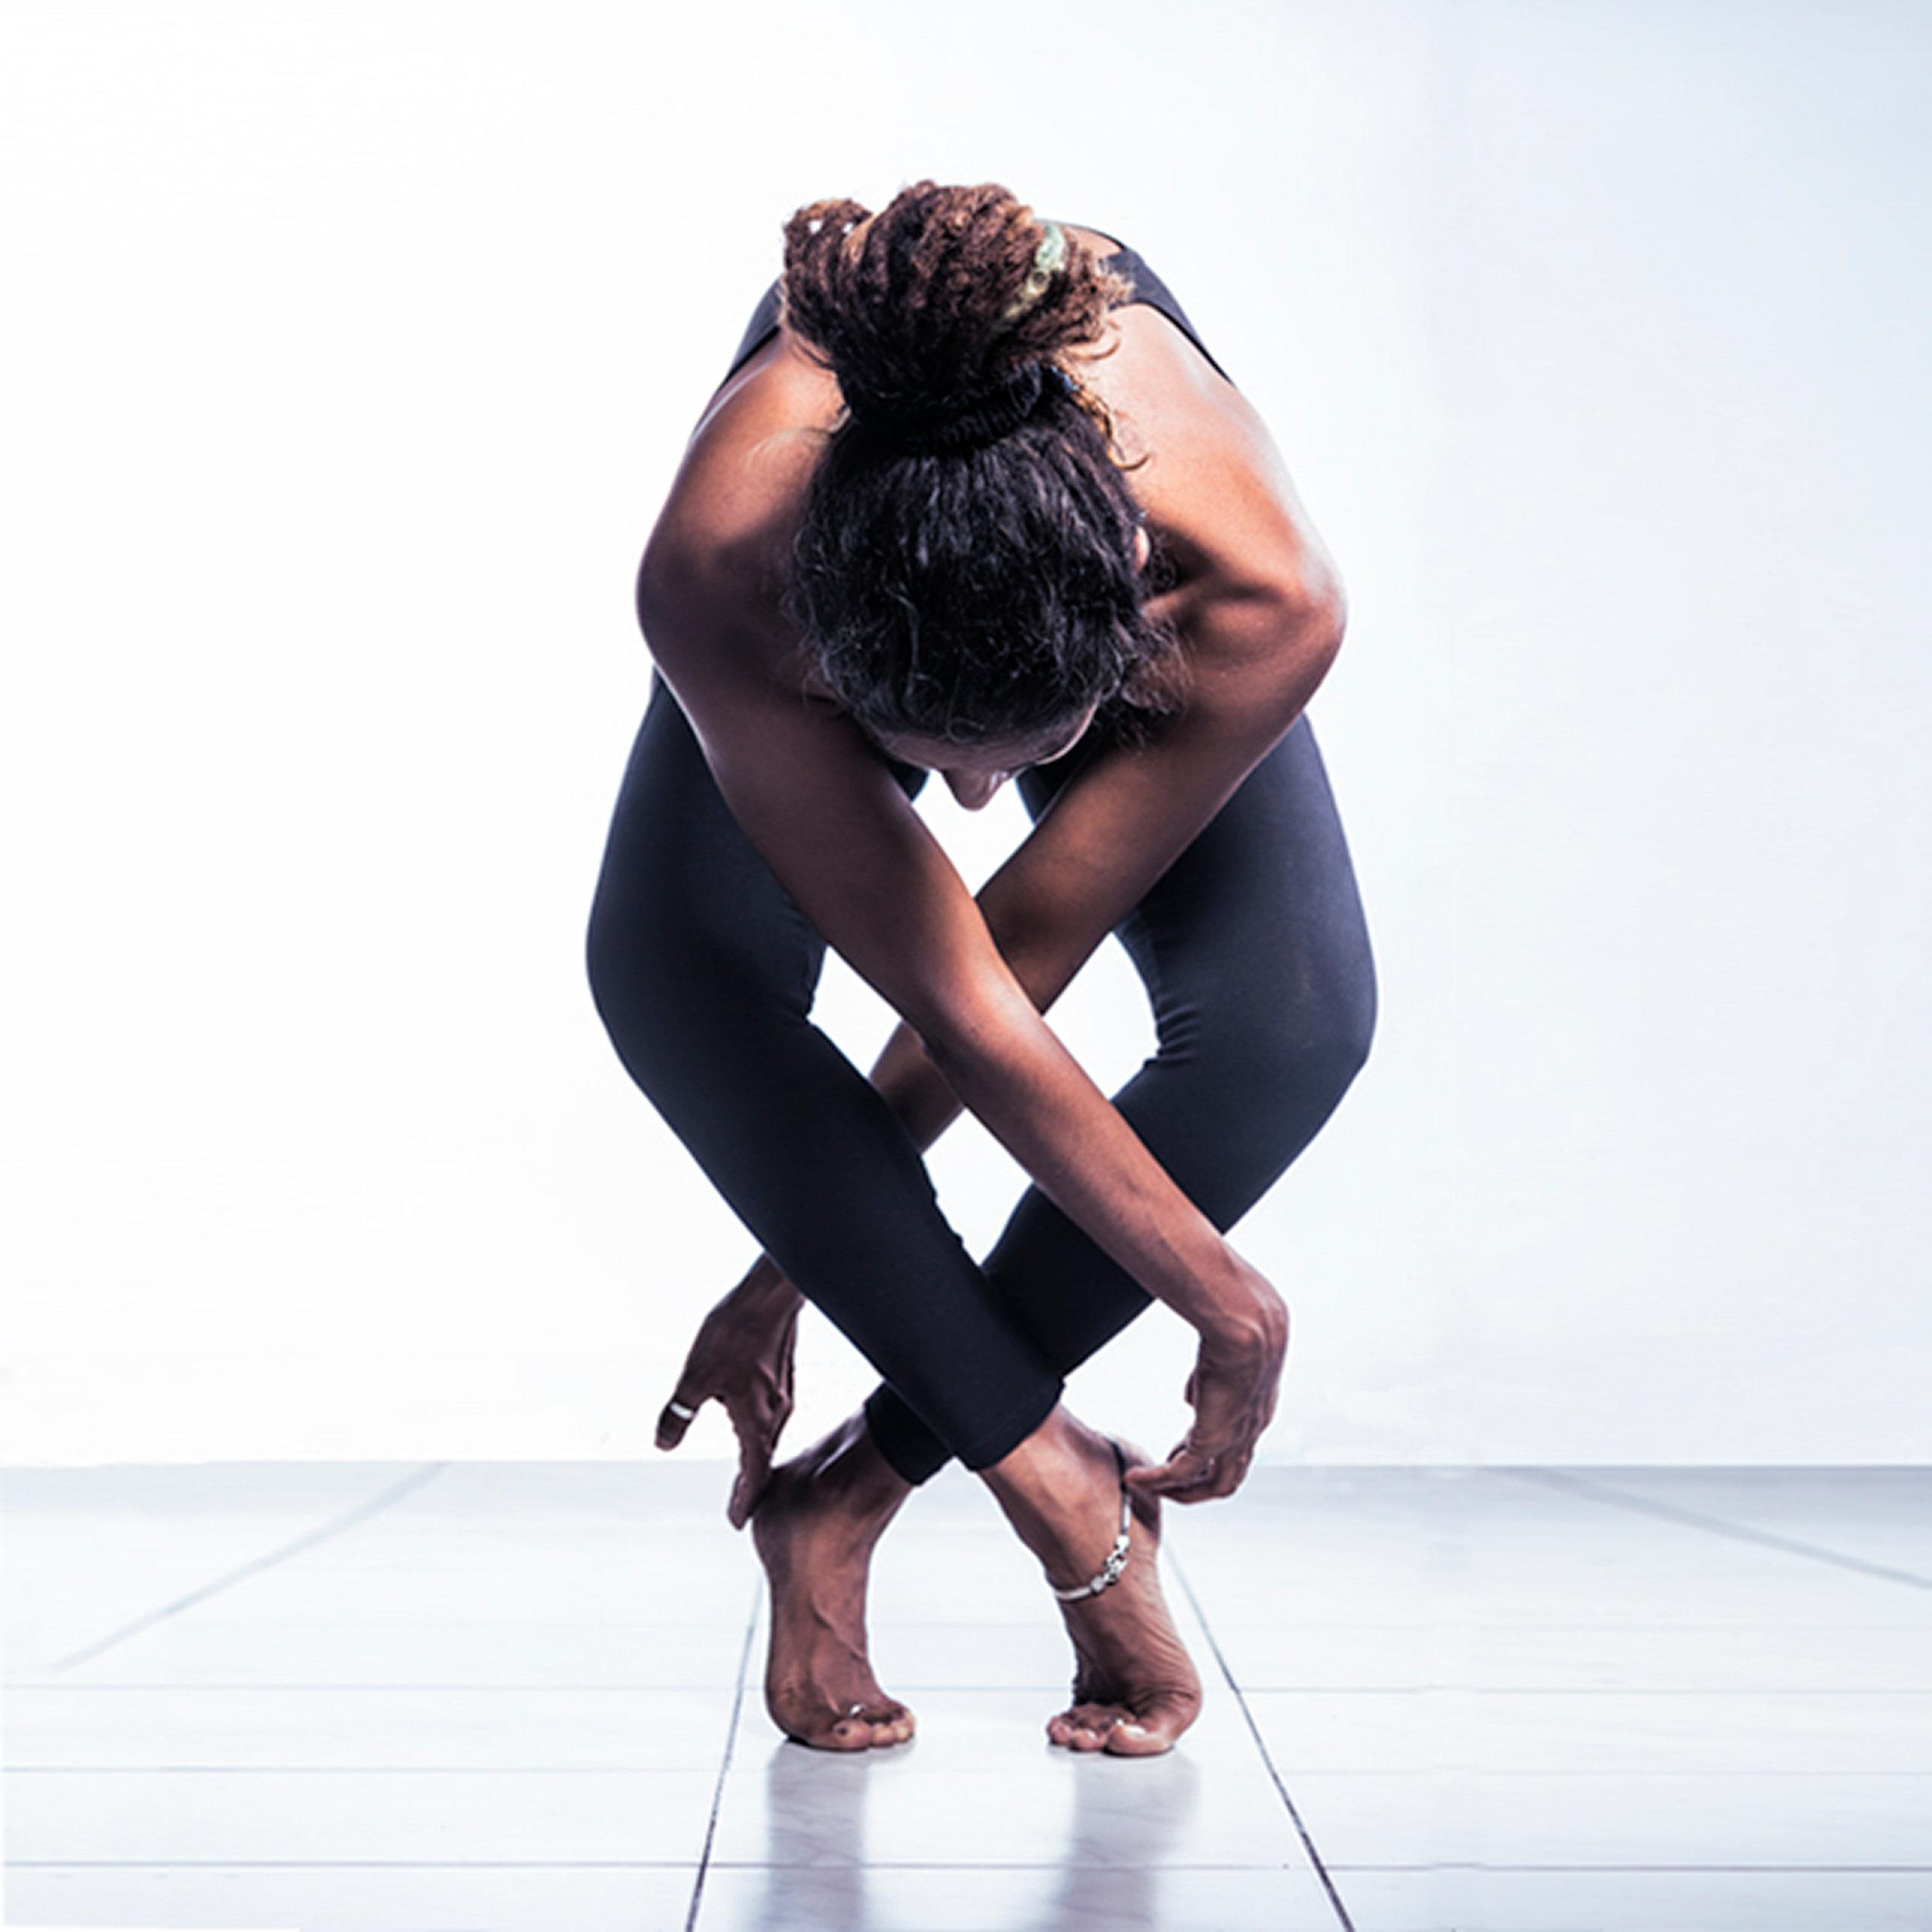 Canva - Woman in Black Pants Doing Yoga.jpg